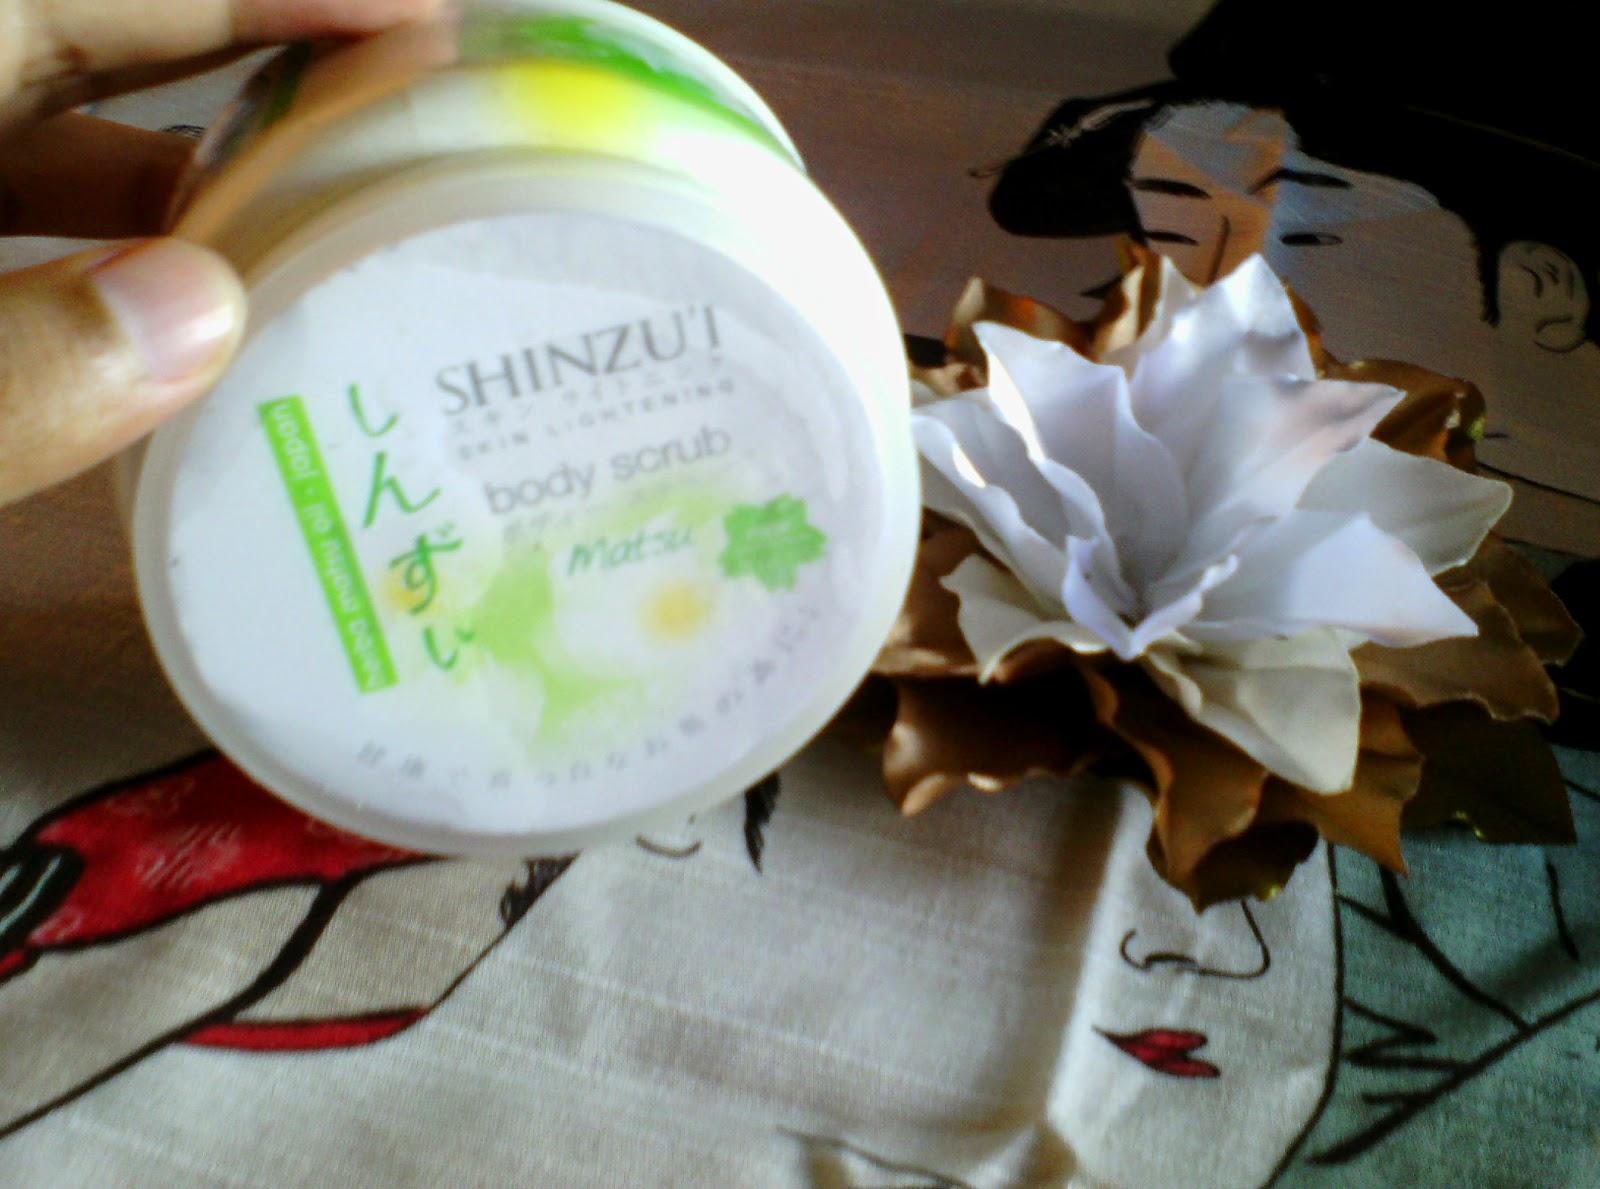 Your Test Shinzui Skin Lightening Body Scrub Matsu Nova Wijaya